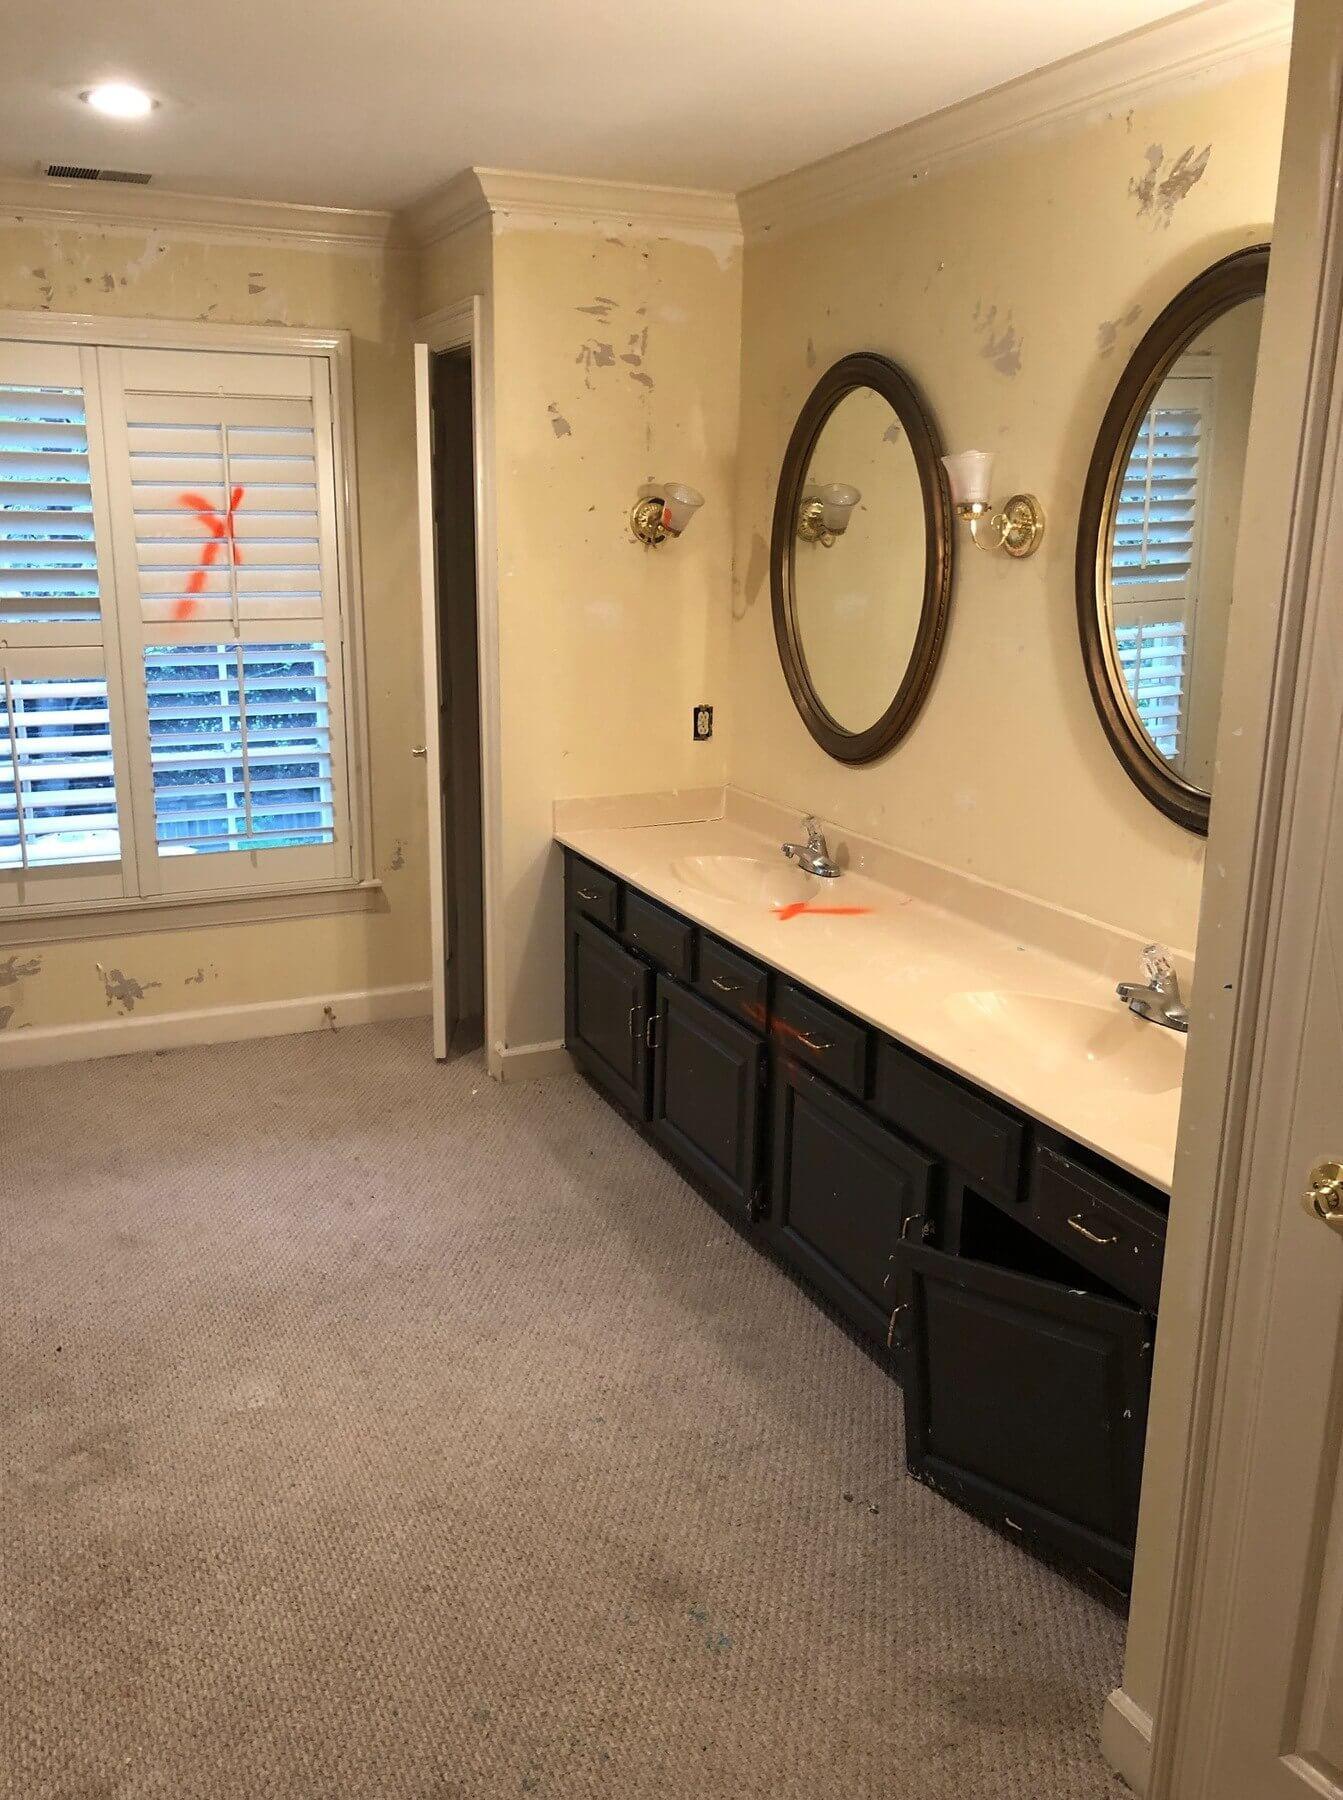 Original vanity before R. Co renovation